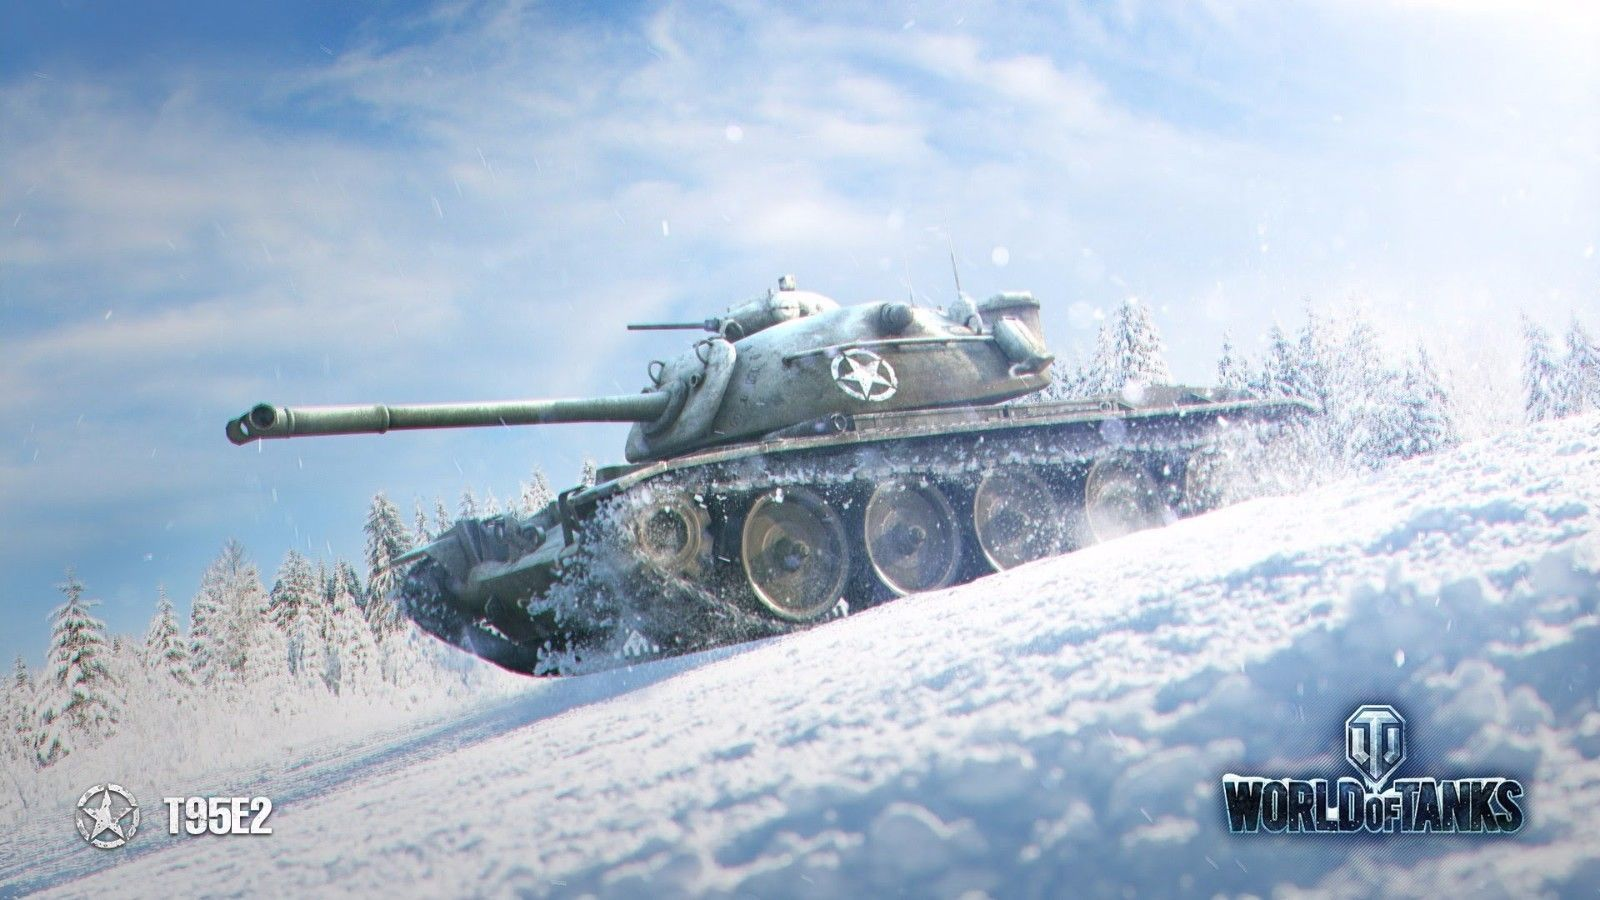 World of tanks, WOT EU, NA, ASIA, Collectors and 50 similar